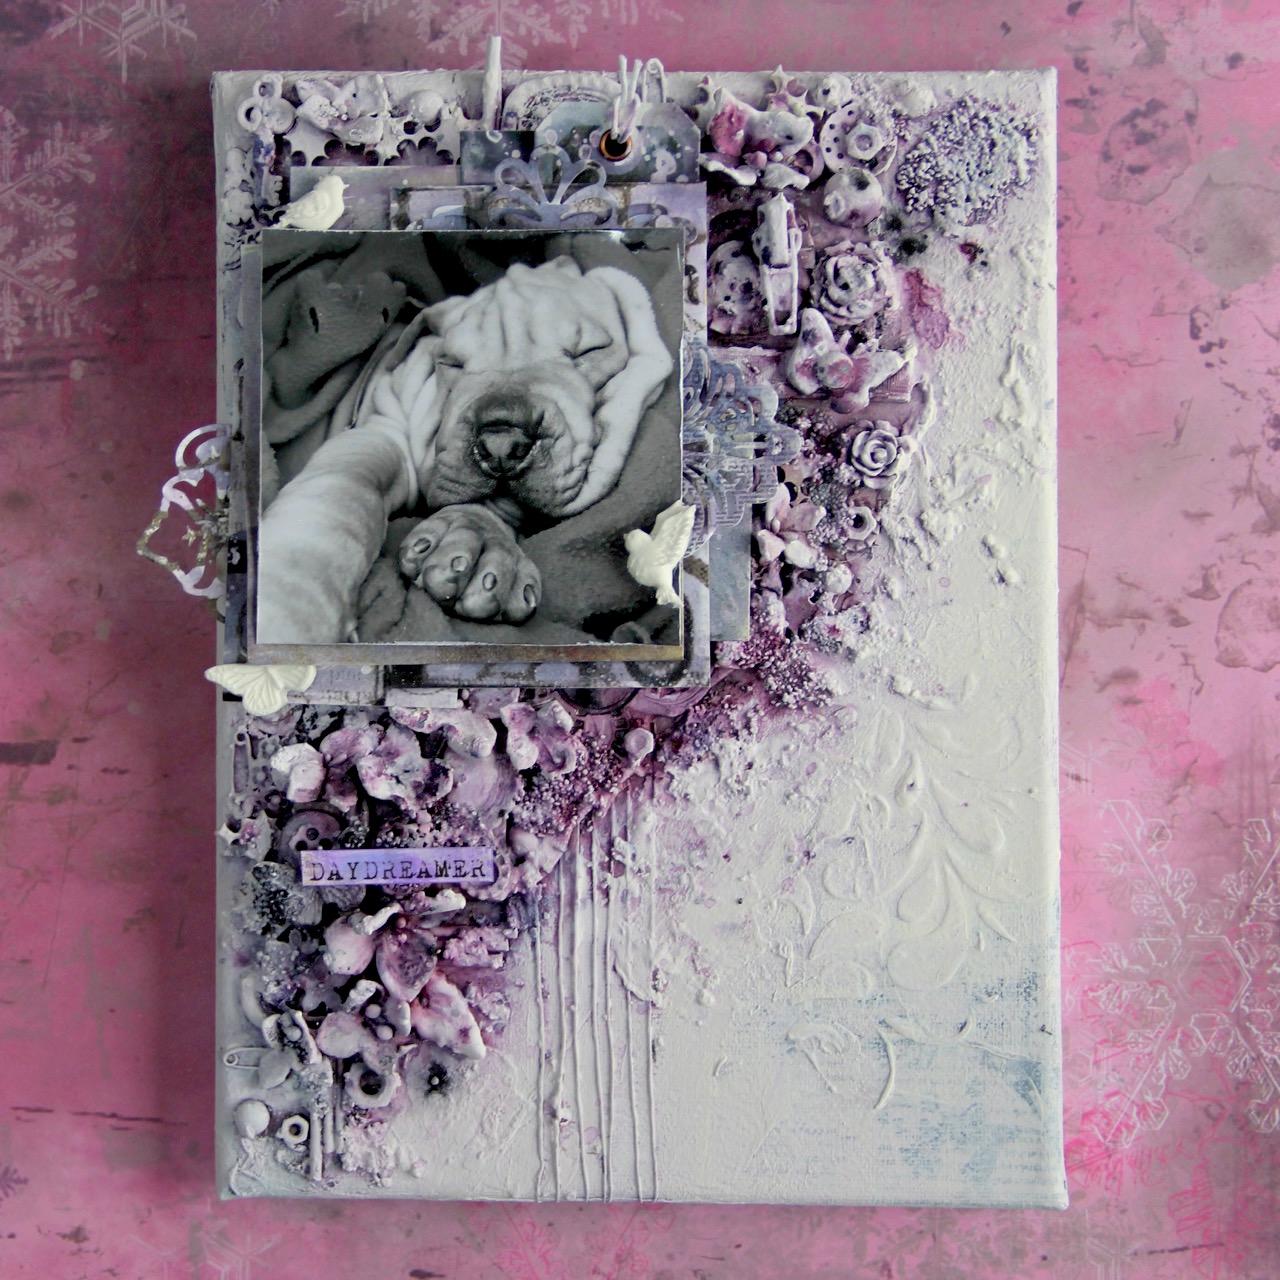 Canvas Daydreamer) - 1